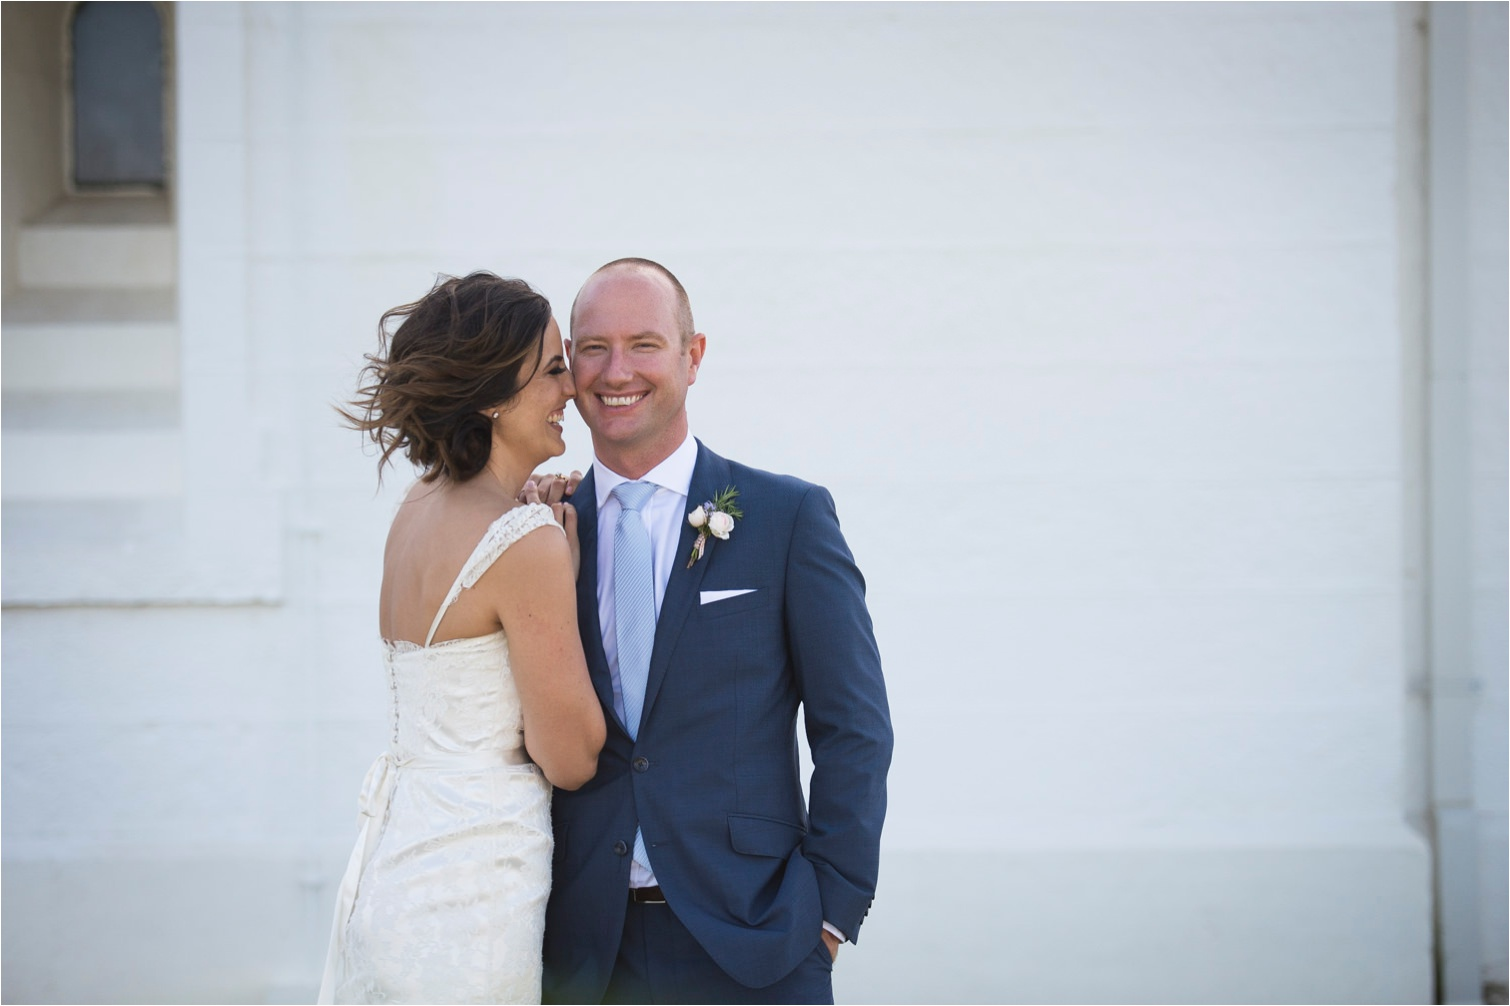 Nicole&Carlie_Watsons_Bay_Hotel_Wedding_by_Gold_Coast_Photographers-The_Follans31.jpg